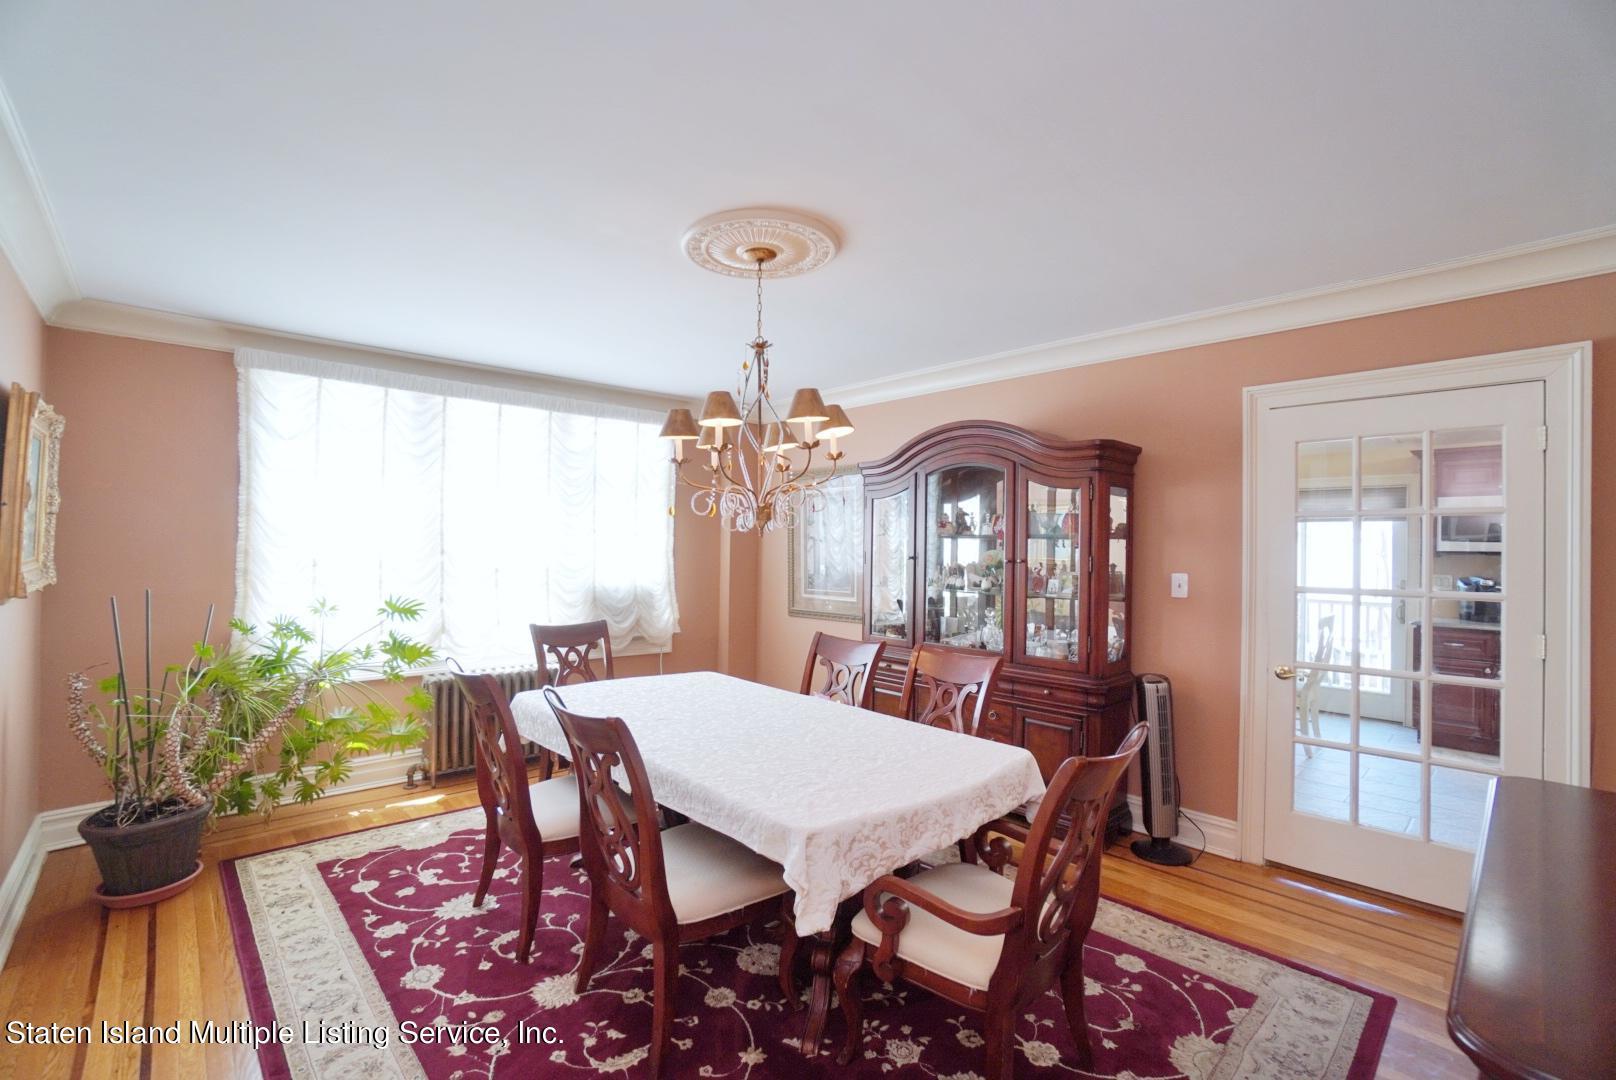 Single Family - Detached 264 Fisher Avenue  Staten Island, NY 10307, MLS-1146898-14